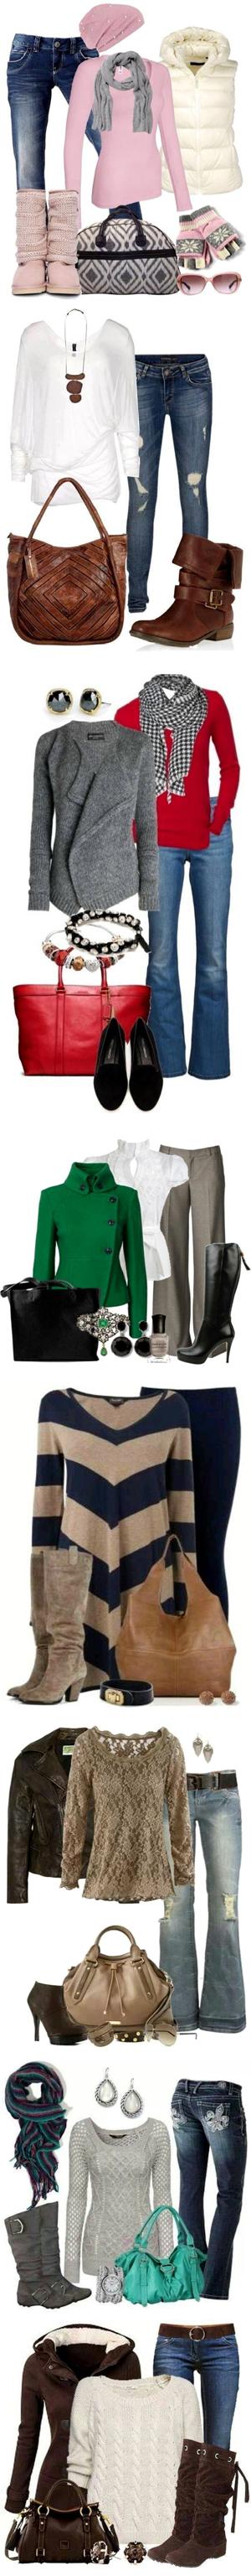 Fabulous Fashion, Fabulous, Polyvore image